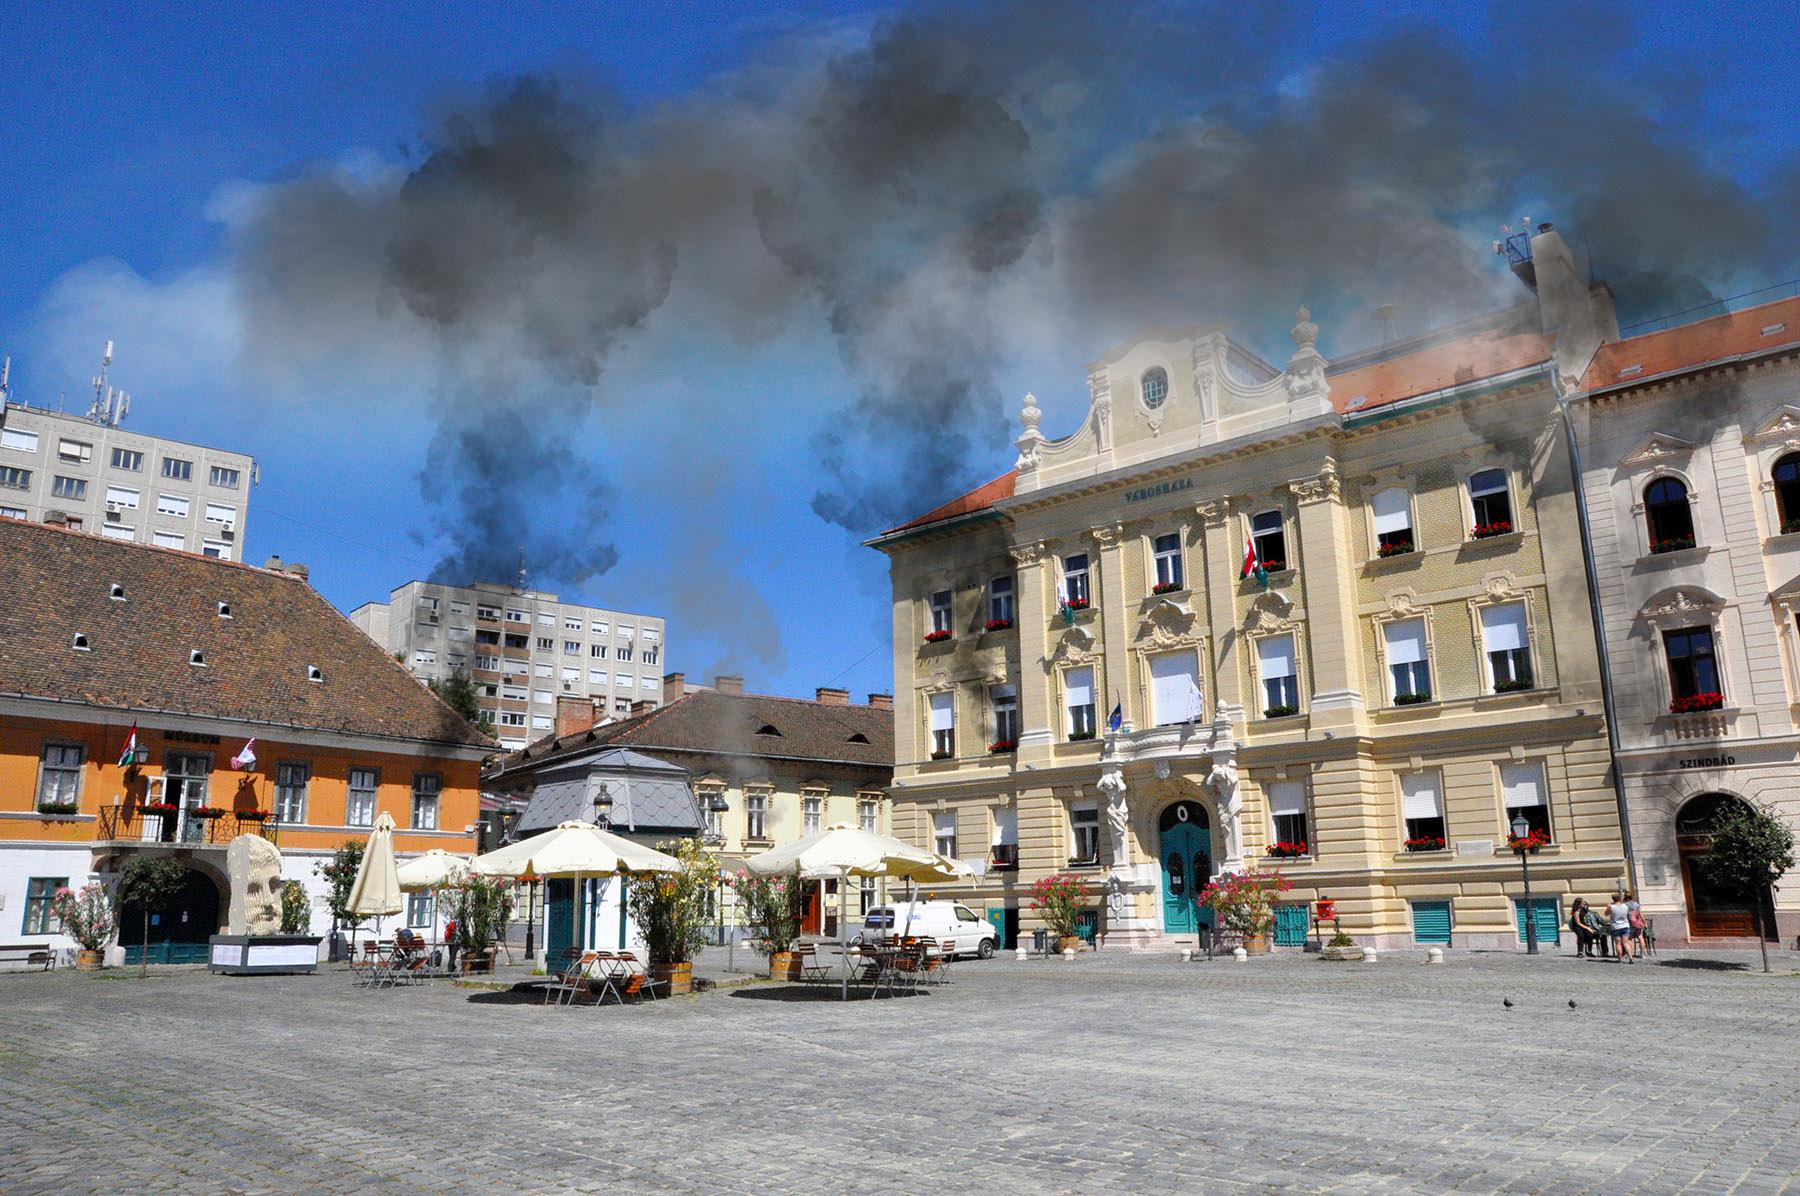 budapest_obuda_fo_ter_smoke.jpg